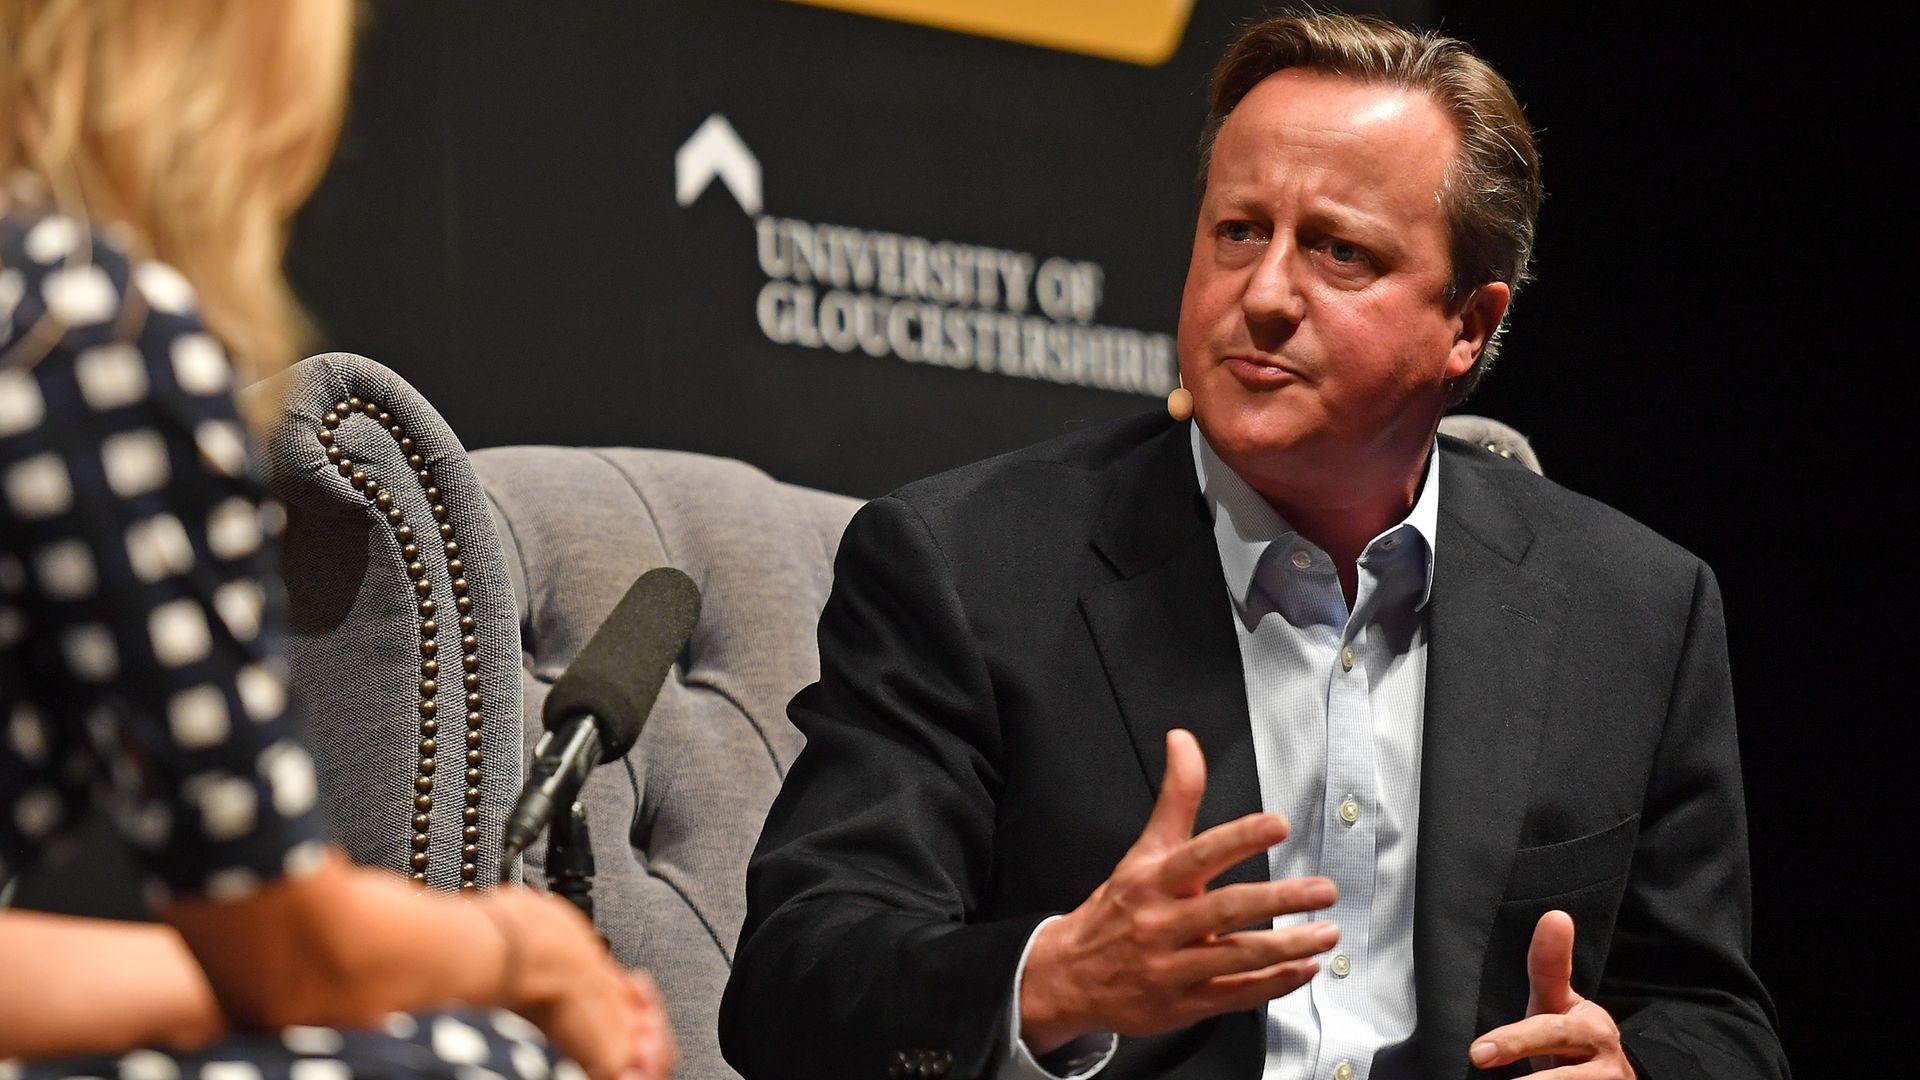 David Cameron speaking to Sophie Raworth during the Cheltenham Literature Festival at Cheltenham Racecourse. - Credit: PA